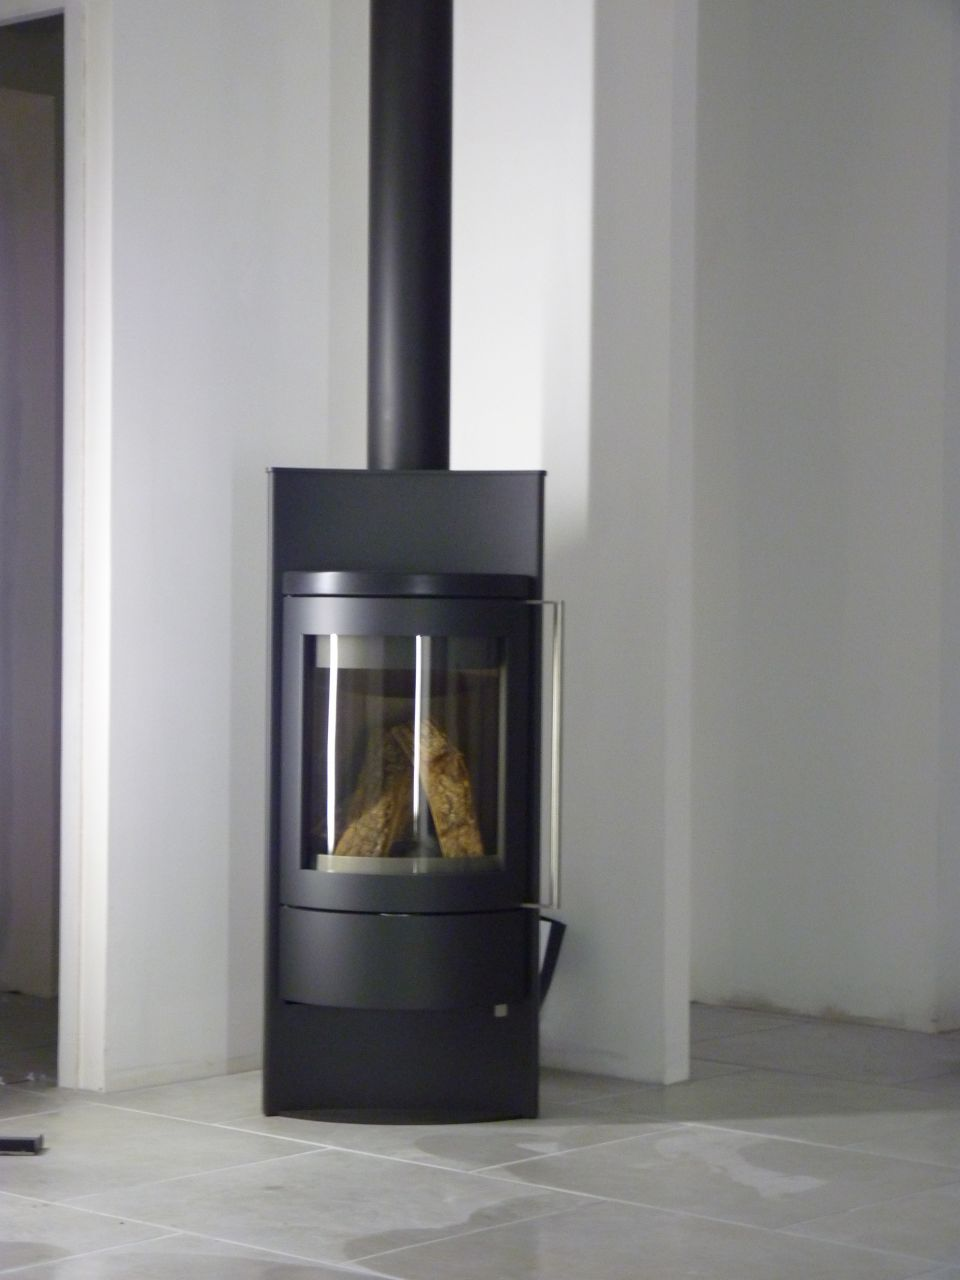 poele a bois escalier isolation des combles tarn. Black Bedroom Furniture Sets. Home Design Ideas